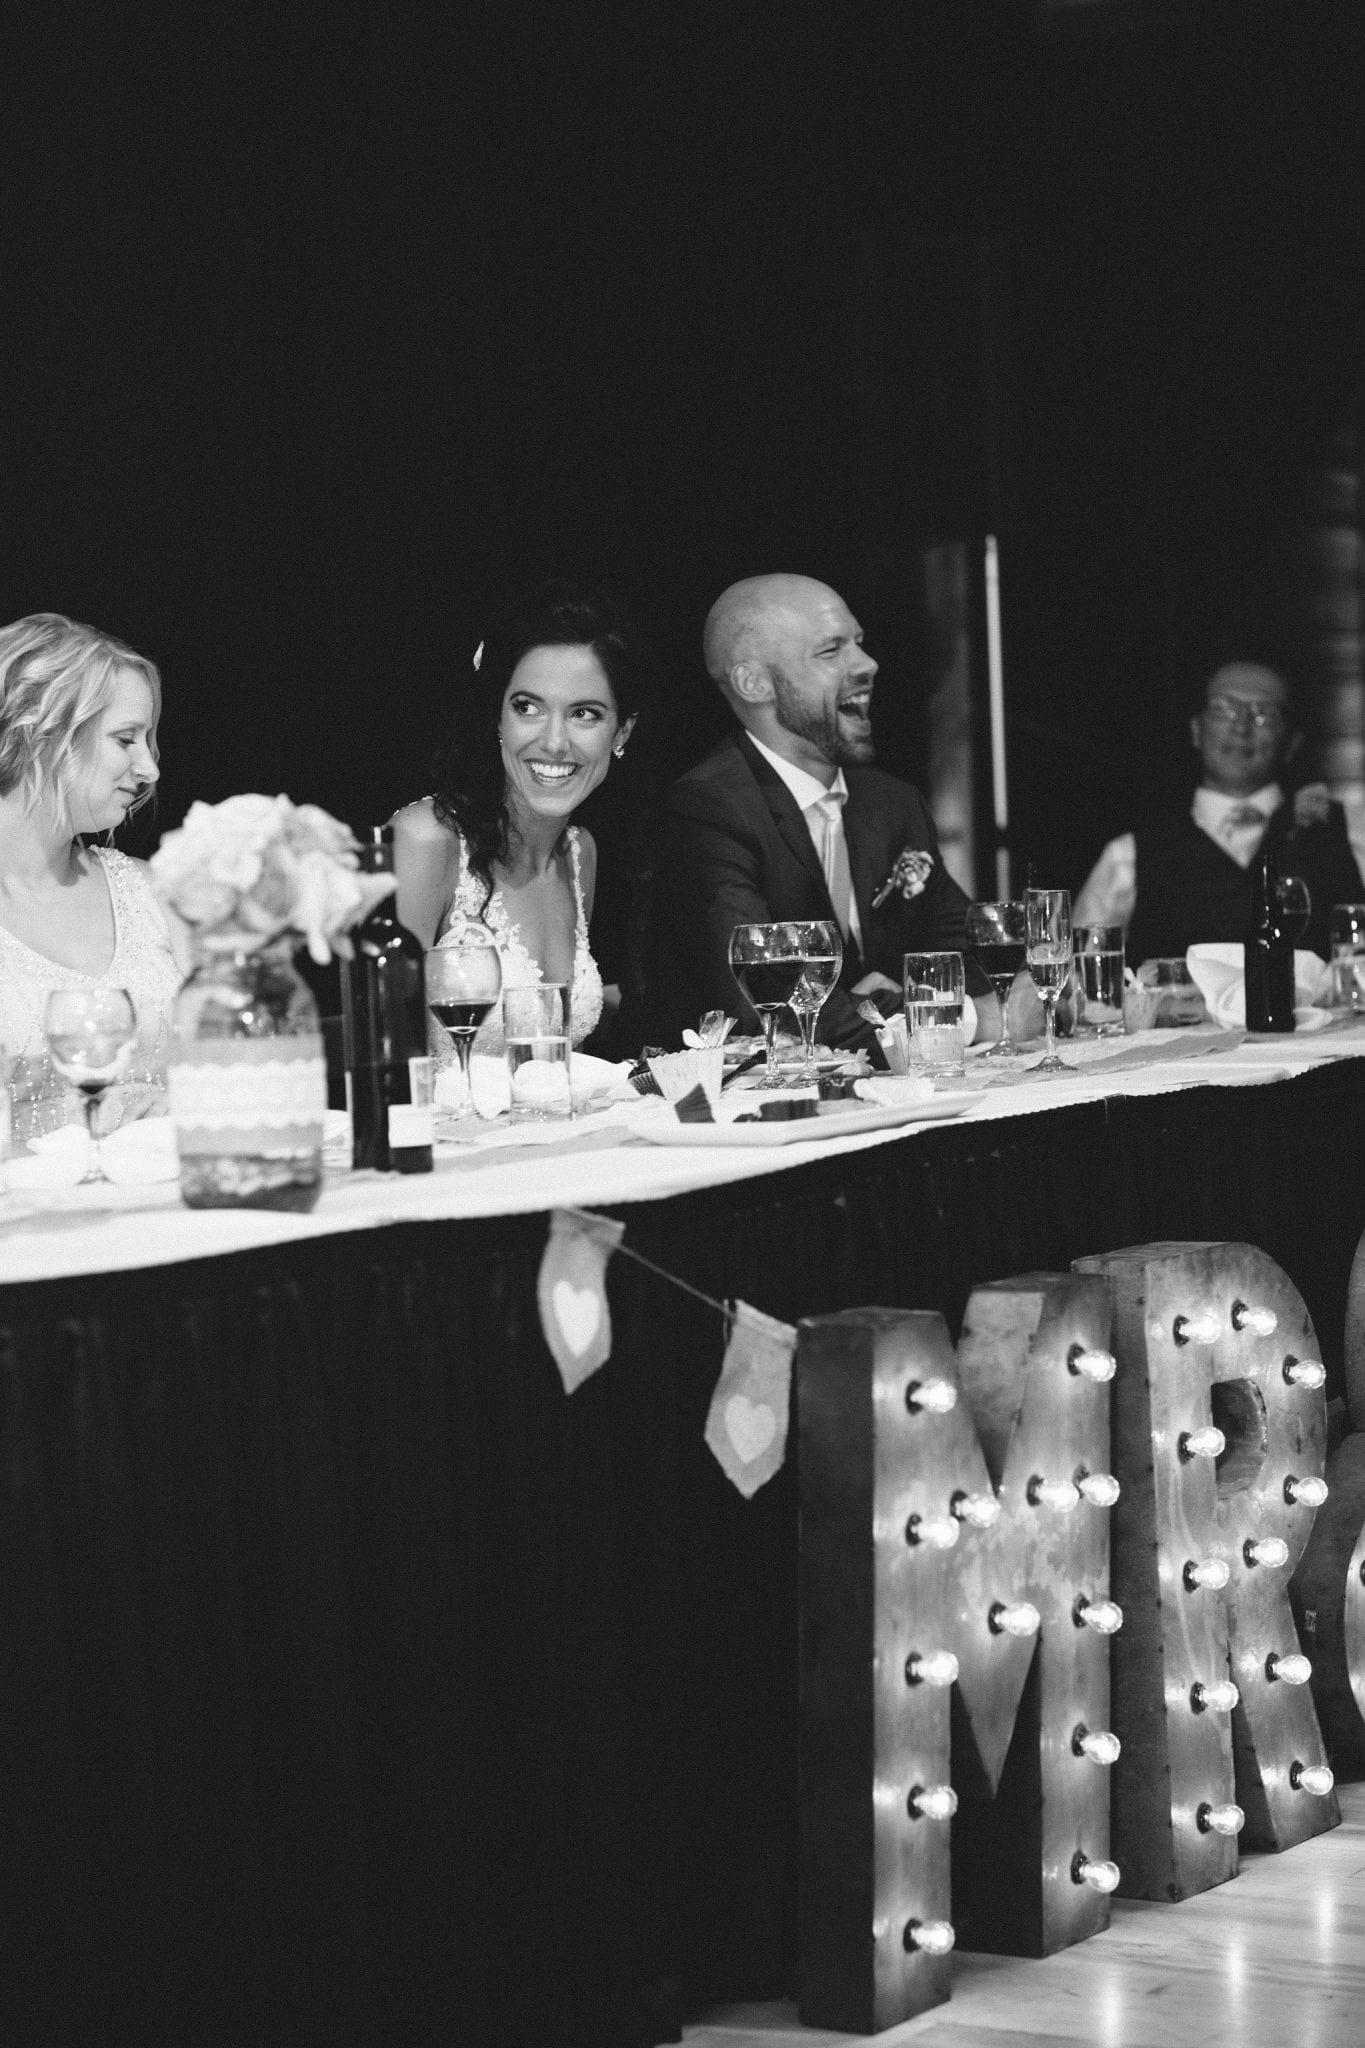 Head table joy - Photo credit Heart & Sparrow Photography